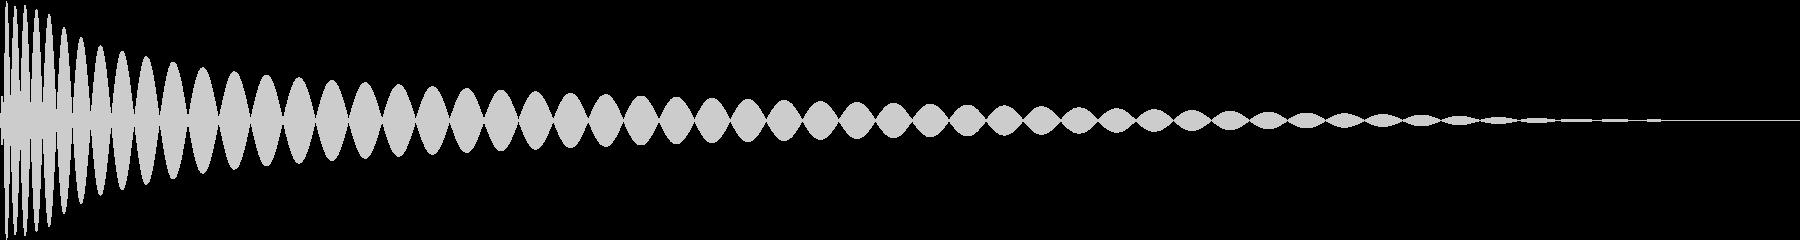 DTM Kick 65 オリジナル音源の未再生の波形